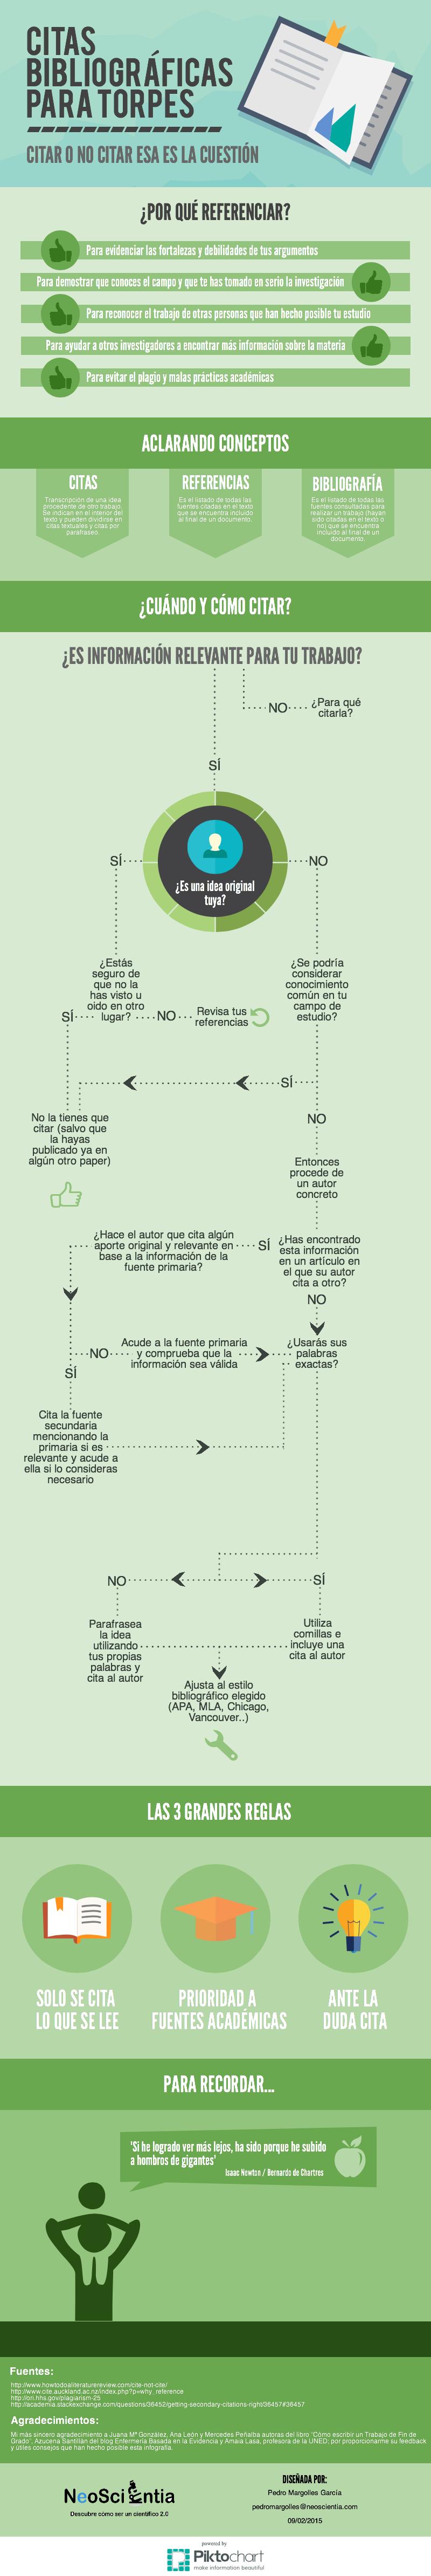 Infografía: Citas bibliográficas para torpes citas bibliográficas